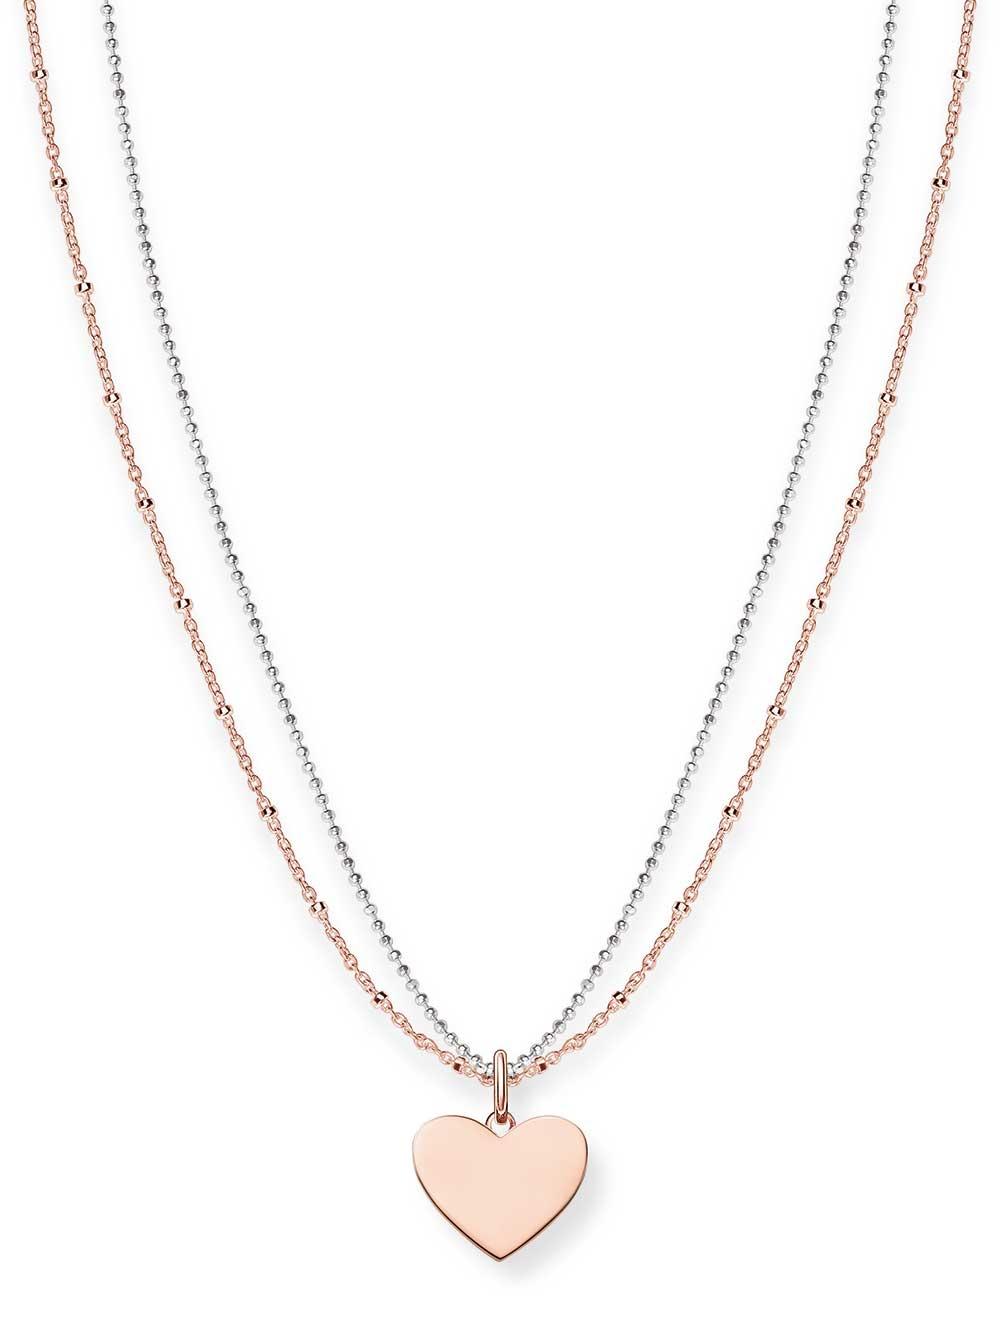 Thomas Sabo Halskette LBKE0004-415-12 925er mit Anhänger Herz 40-45cm